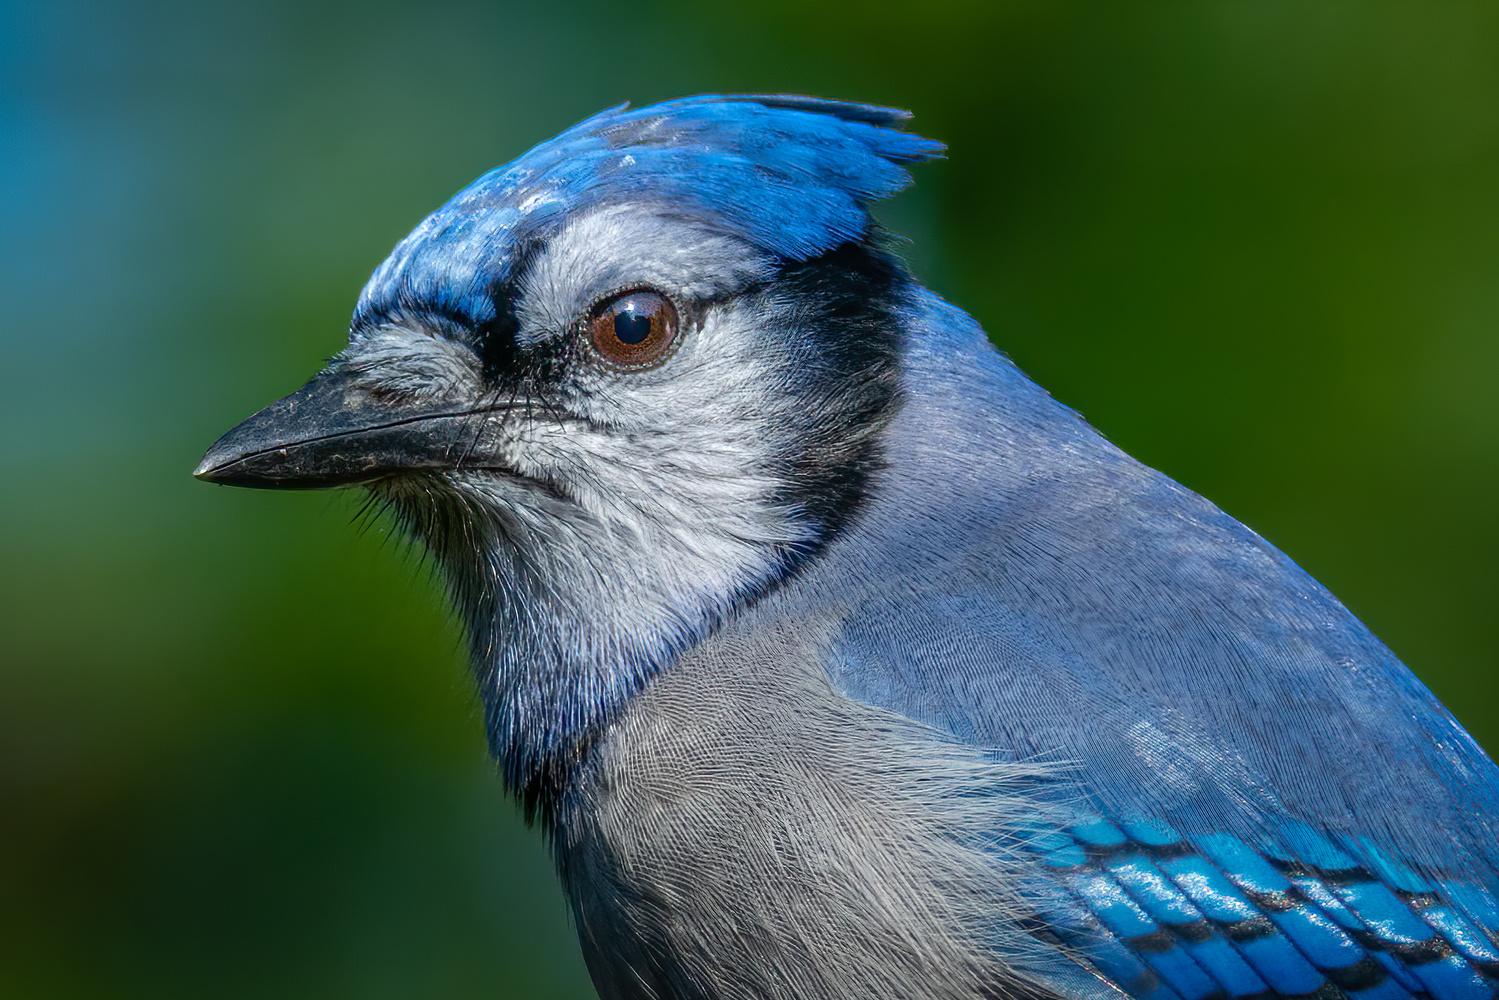 Blue Jay by Jim Elve